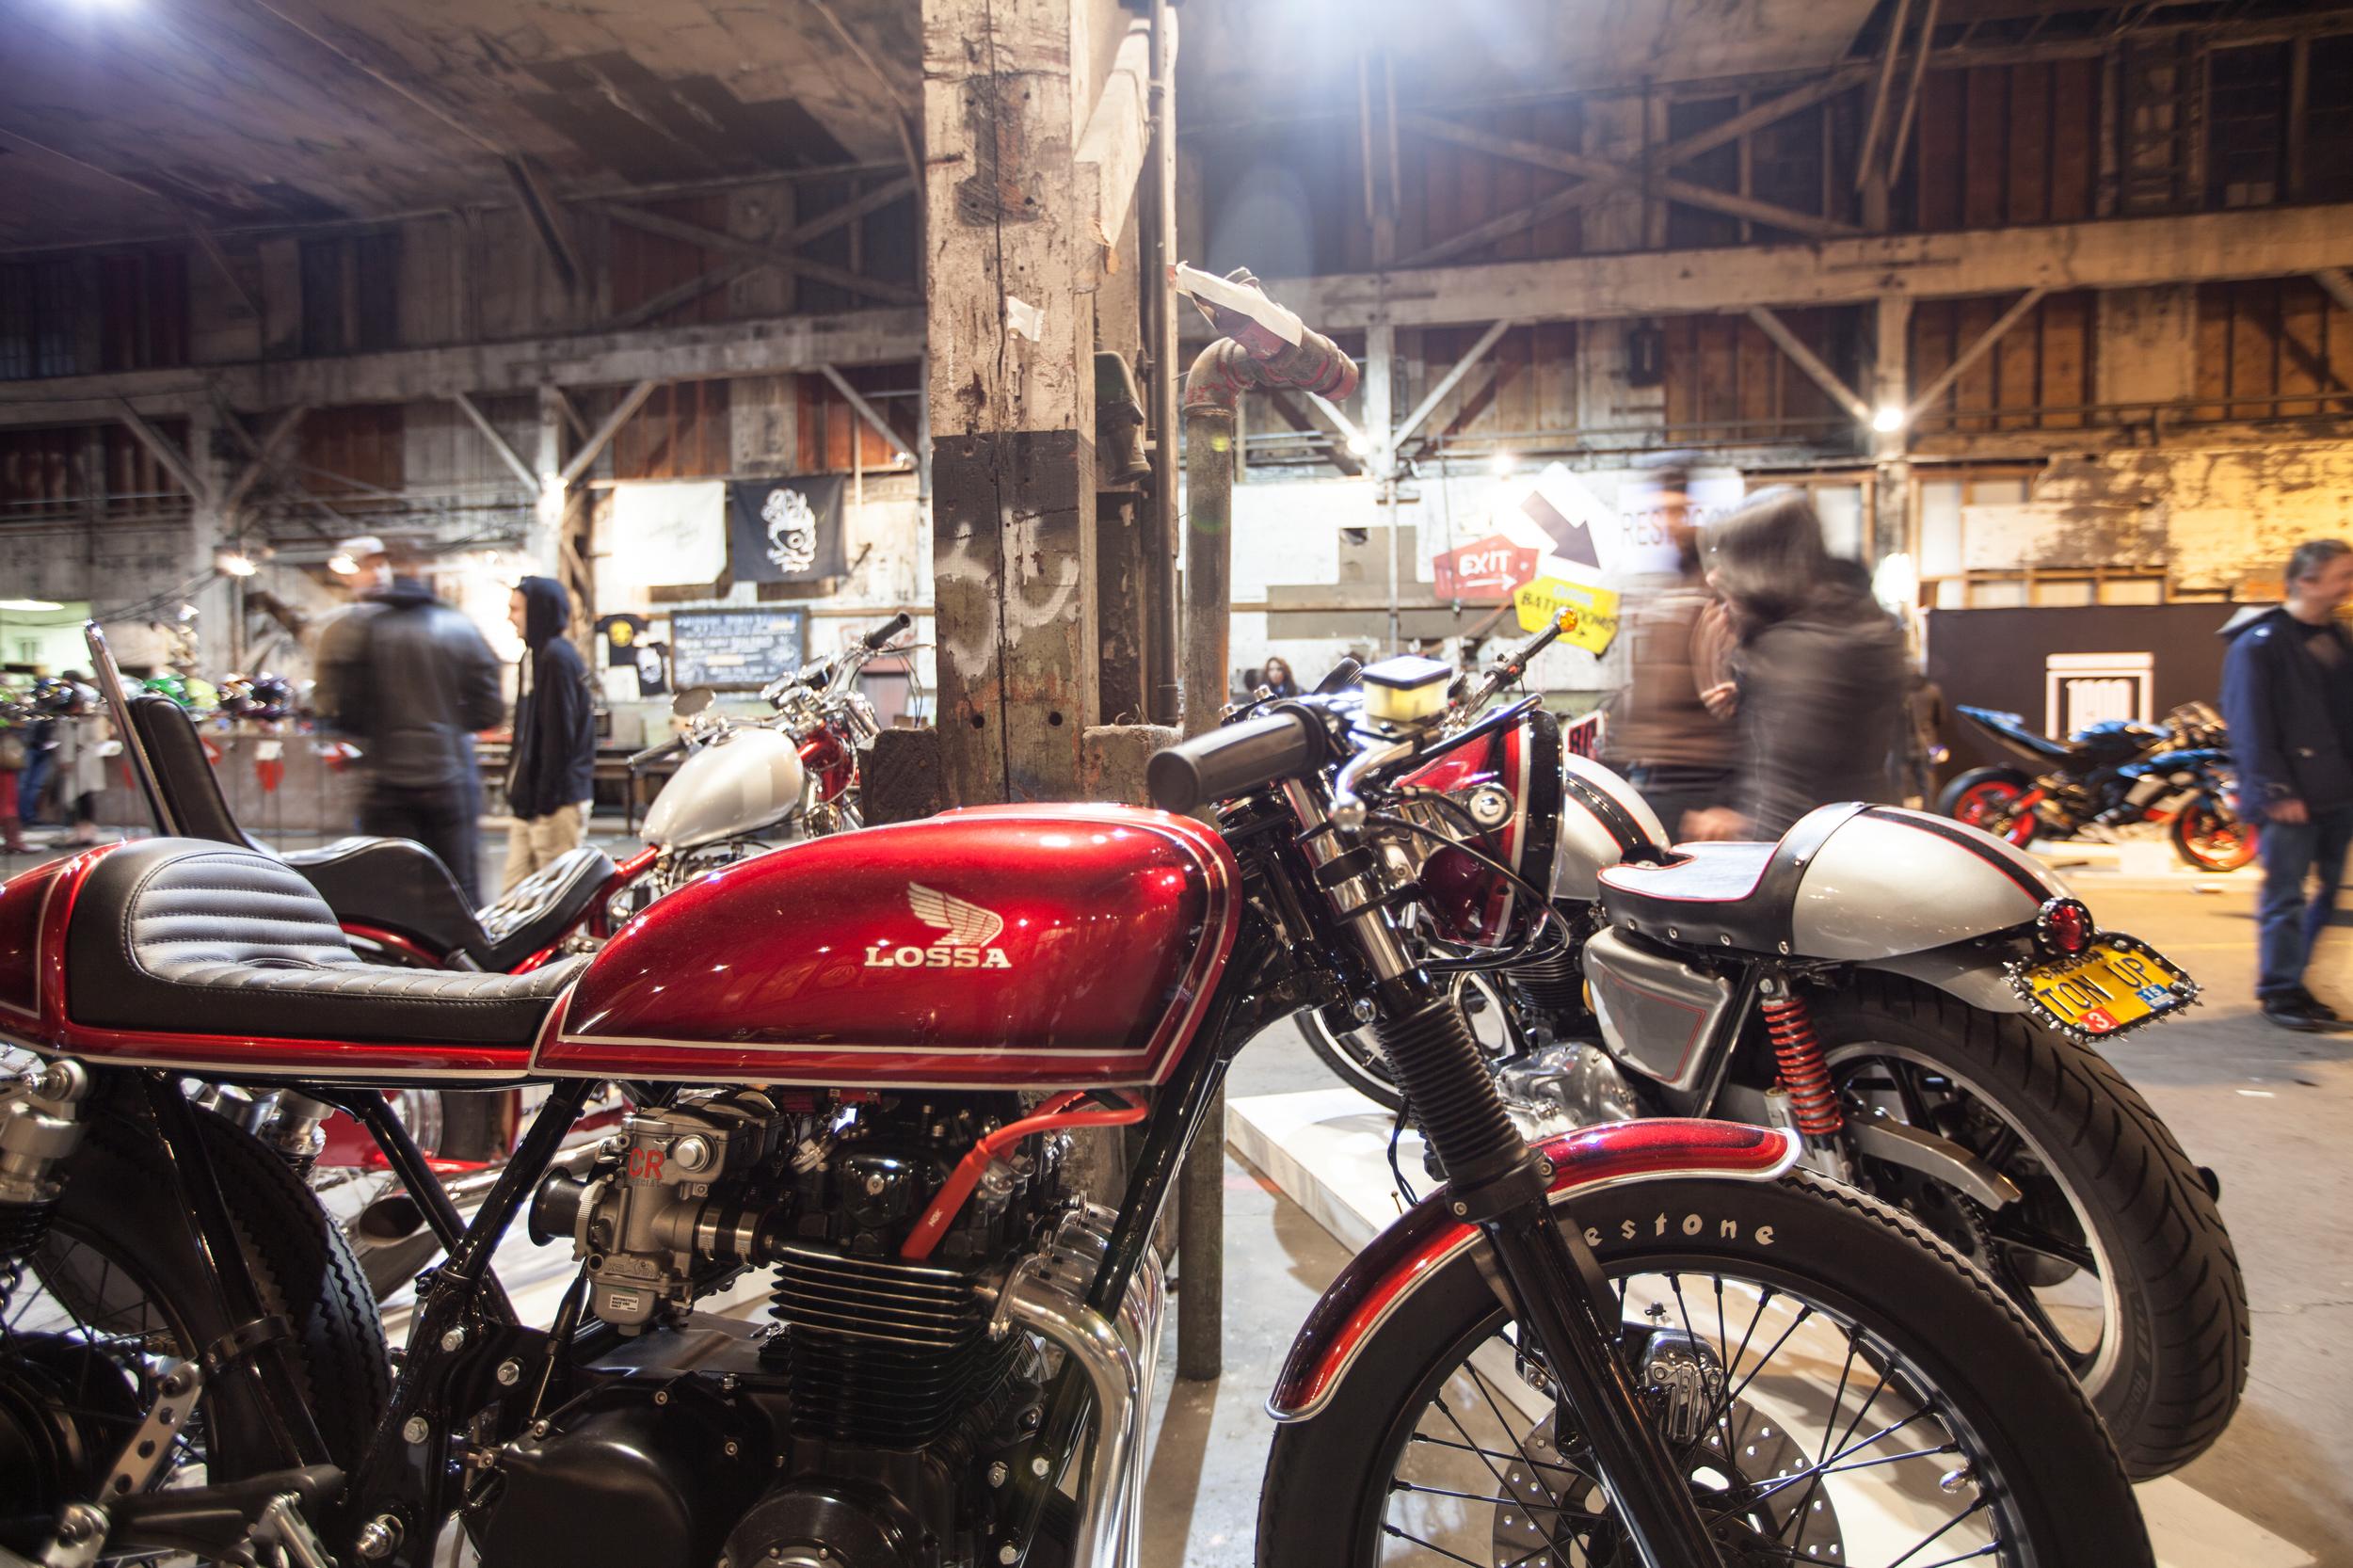 02-14-15 The 1 Moto Show - 2_-23-22.jpg